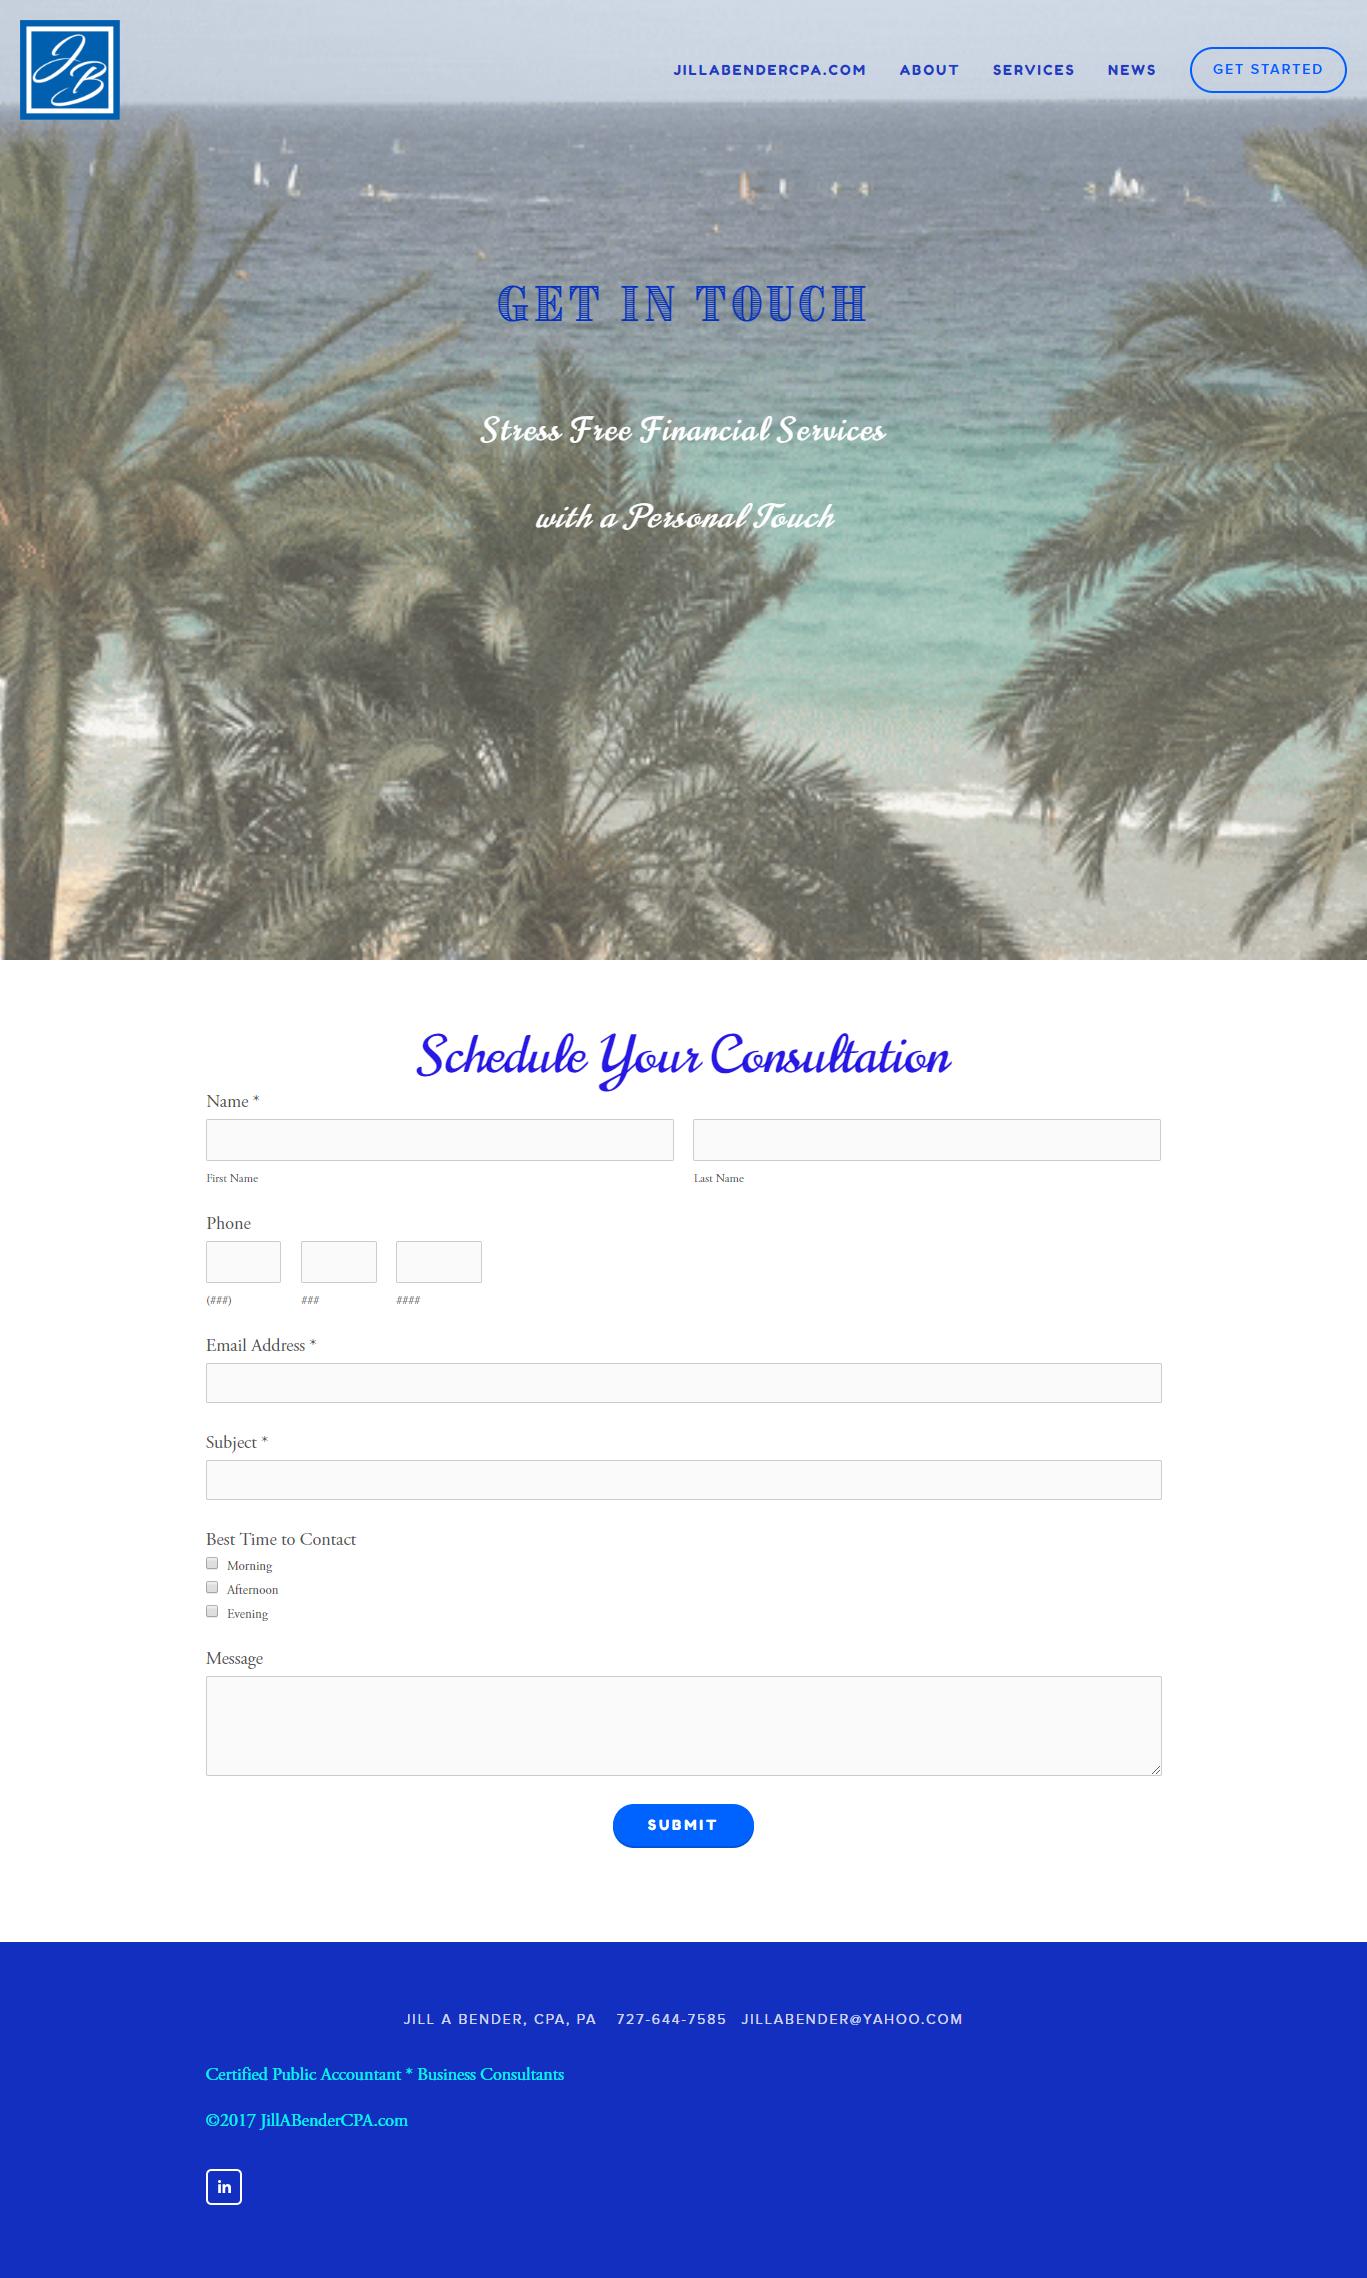 Conversion Page